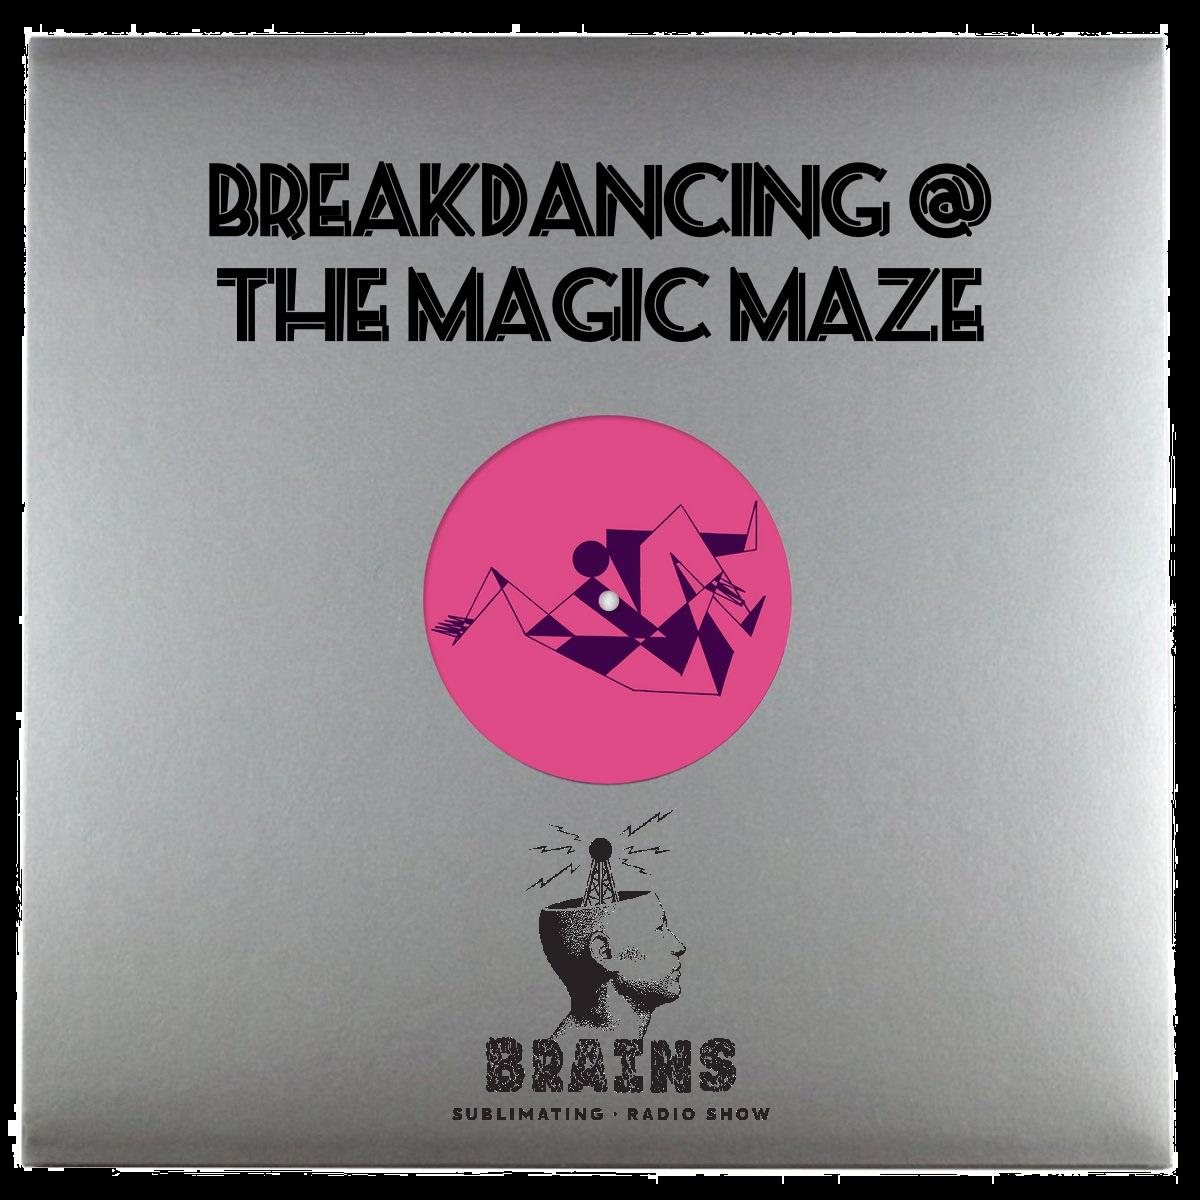 Breakdancing - The Magic Maze